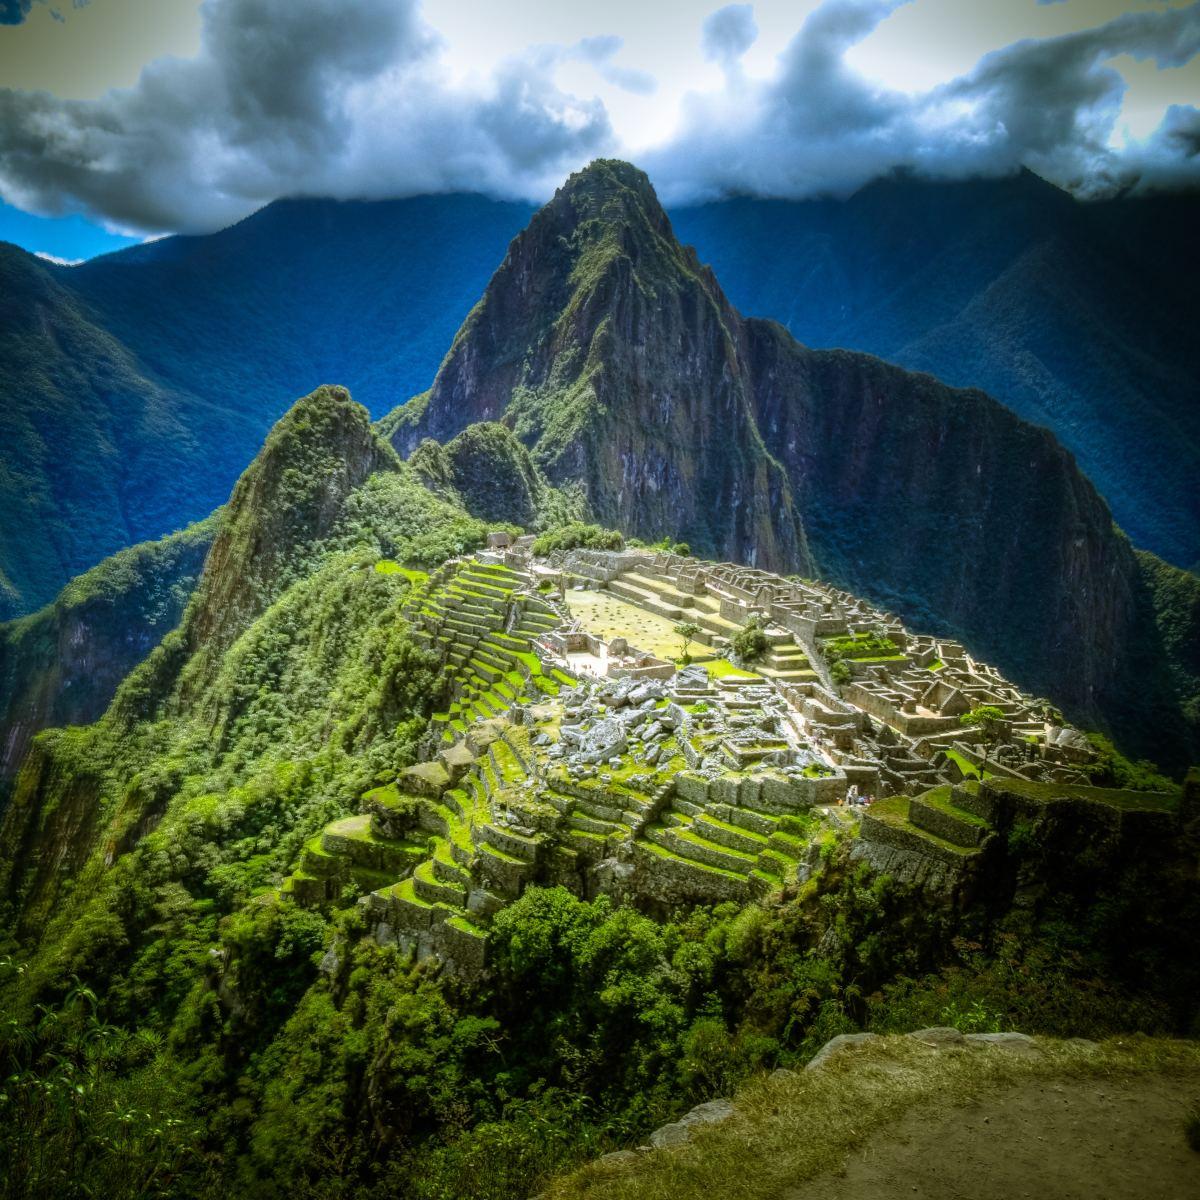 Machu Pichu, Another Lost City